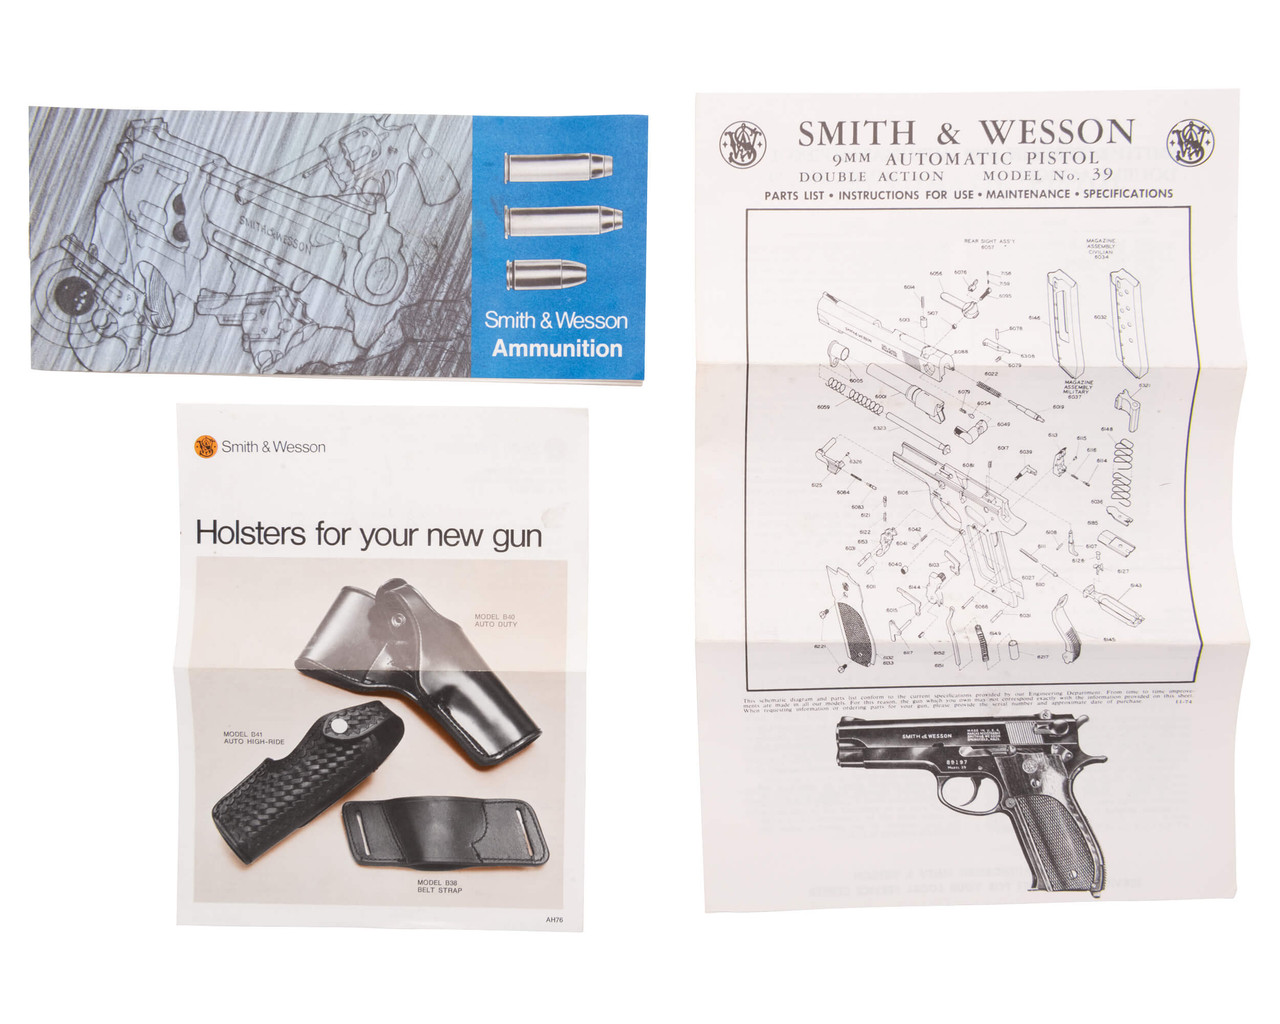 Smith & Wesson 39-2 - Canton Vaud Police - sn A567xxx